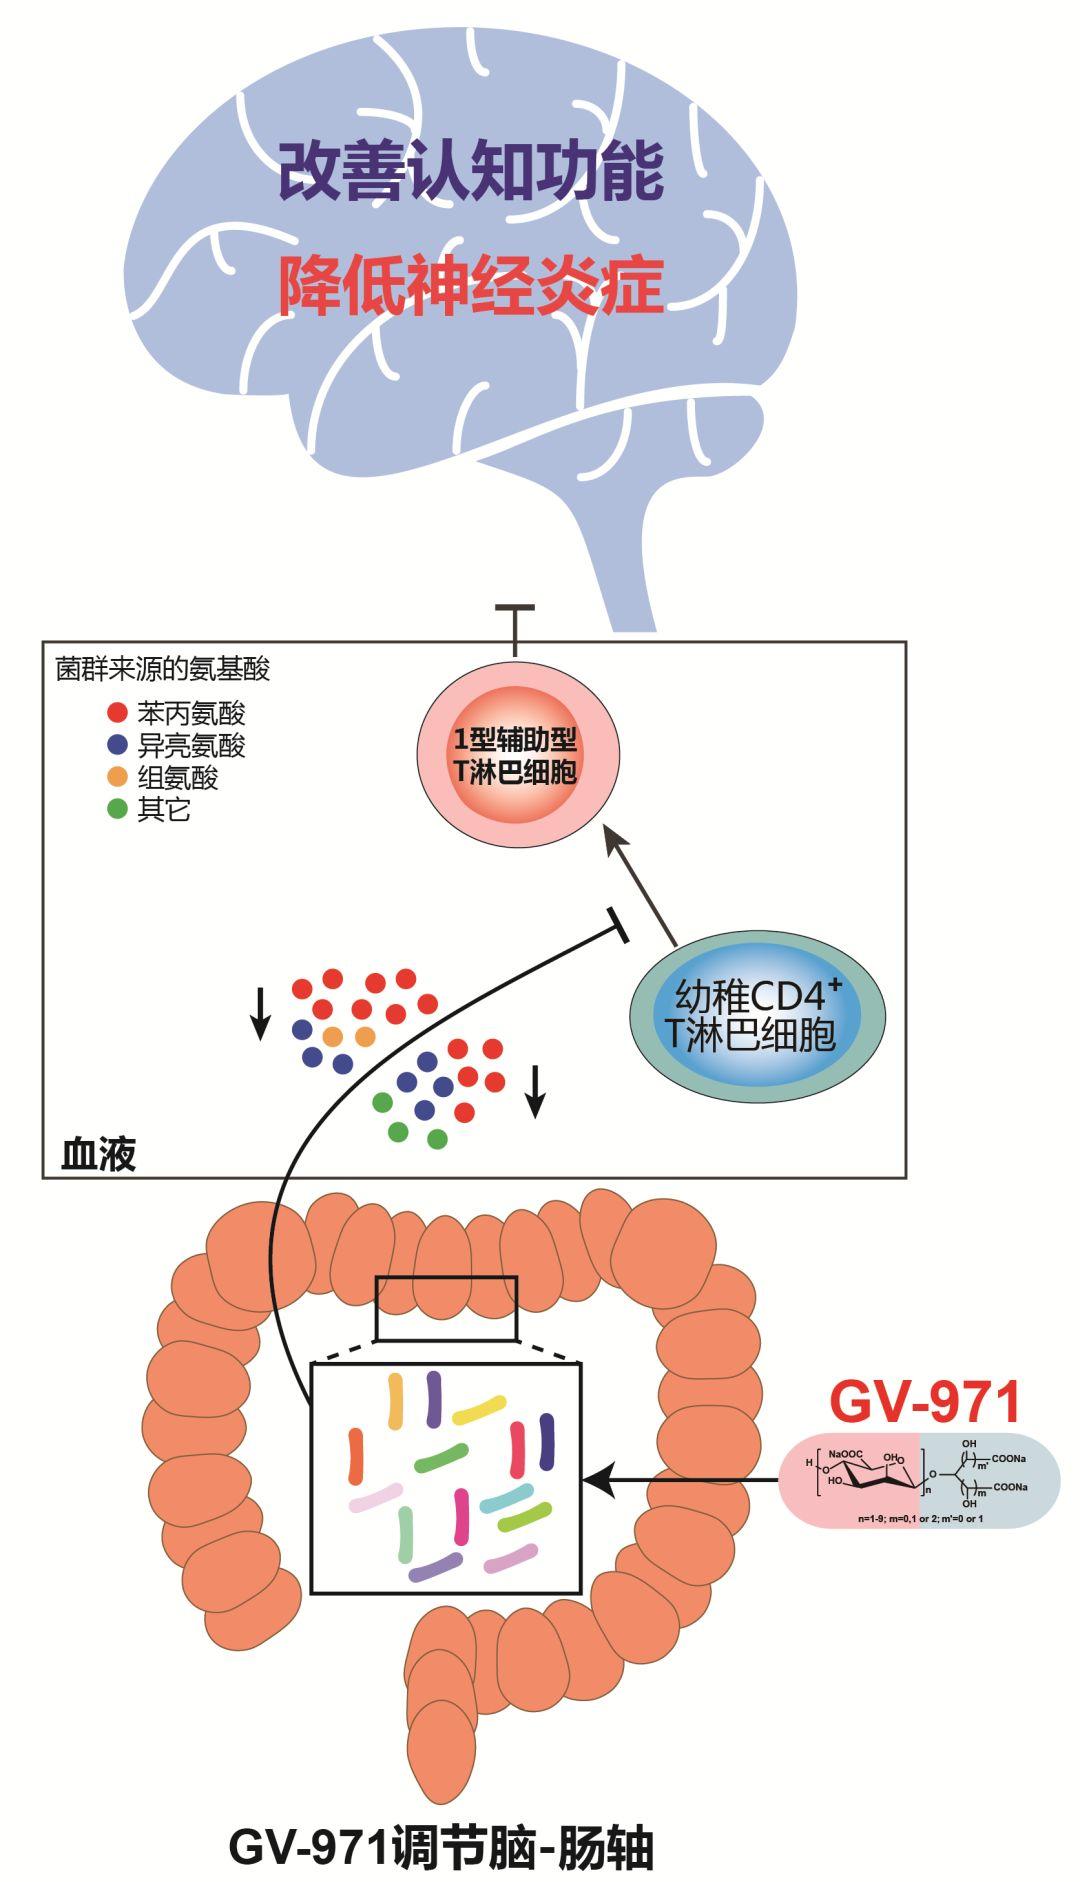 GV-971作用机理示意图.jpg